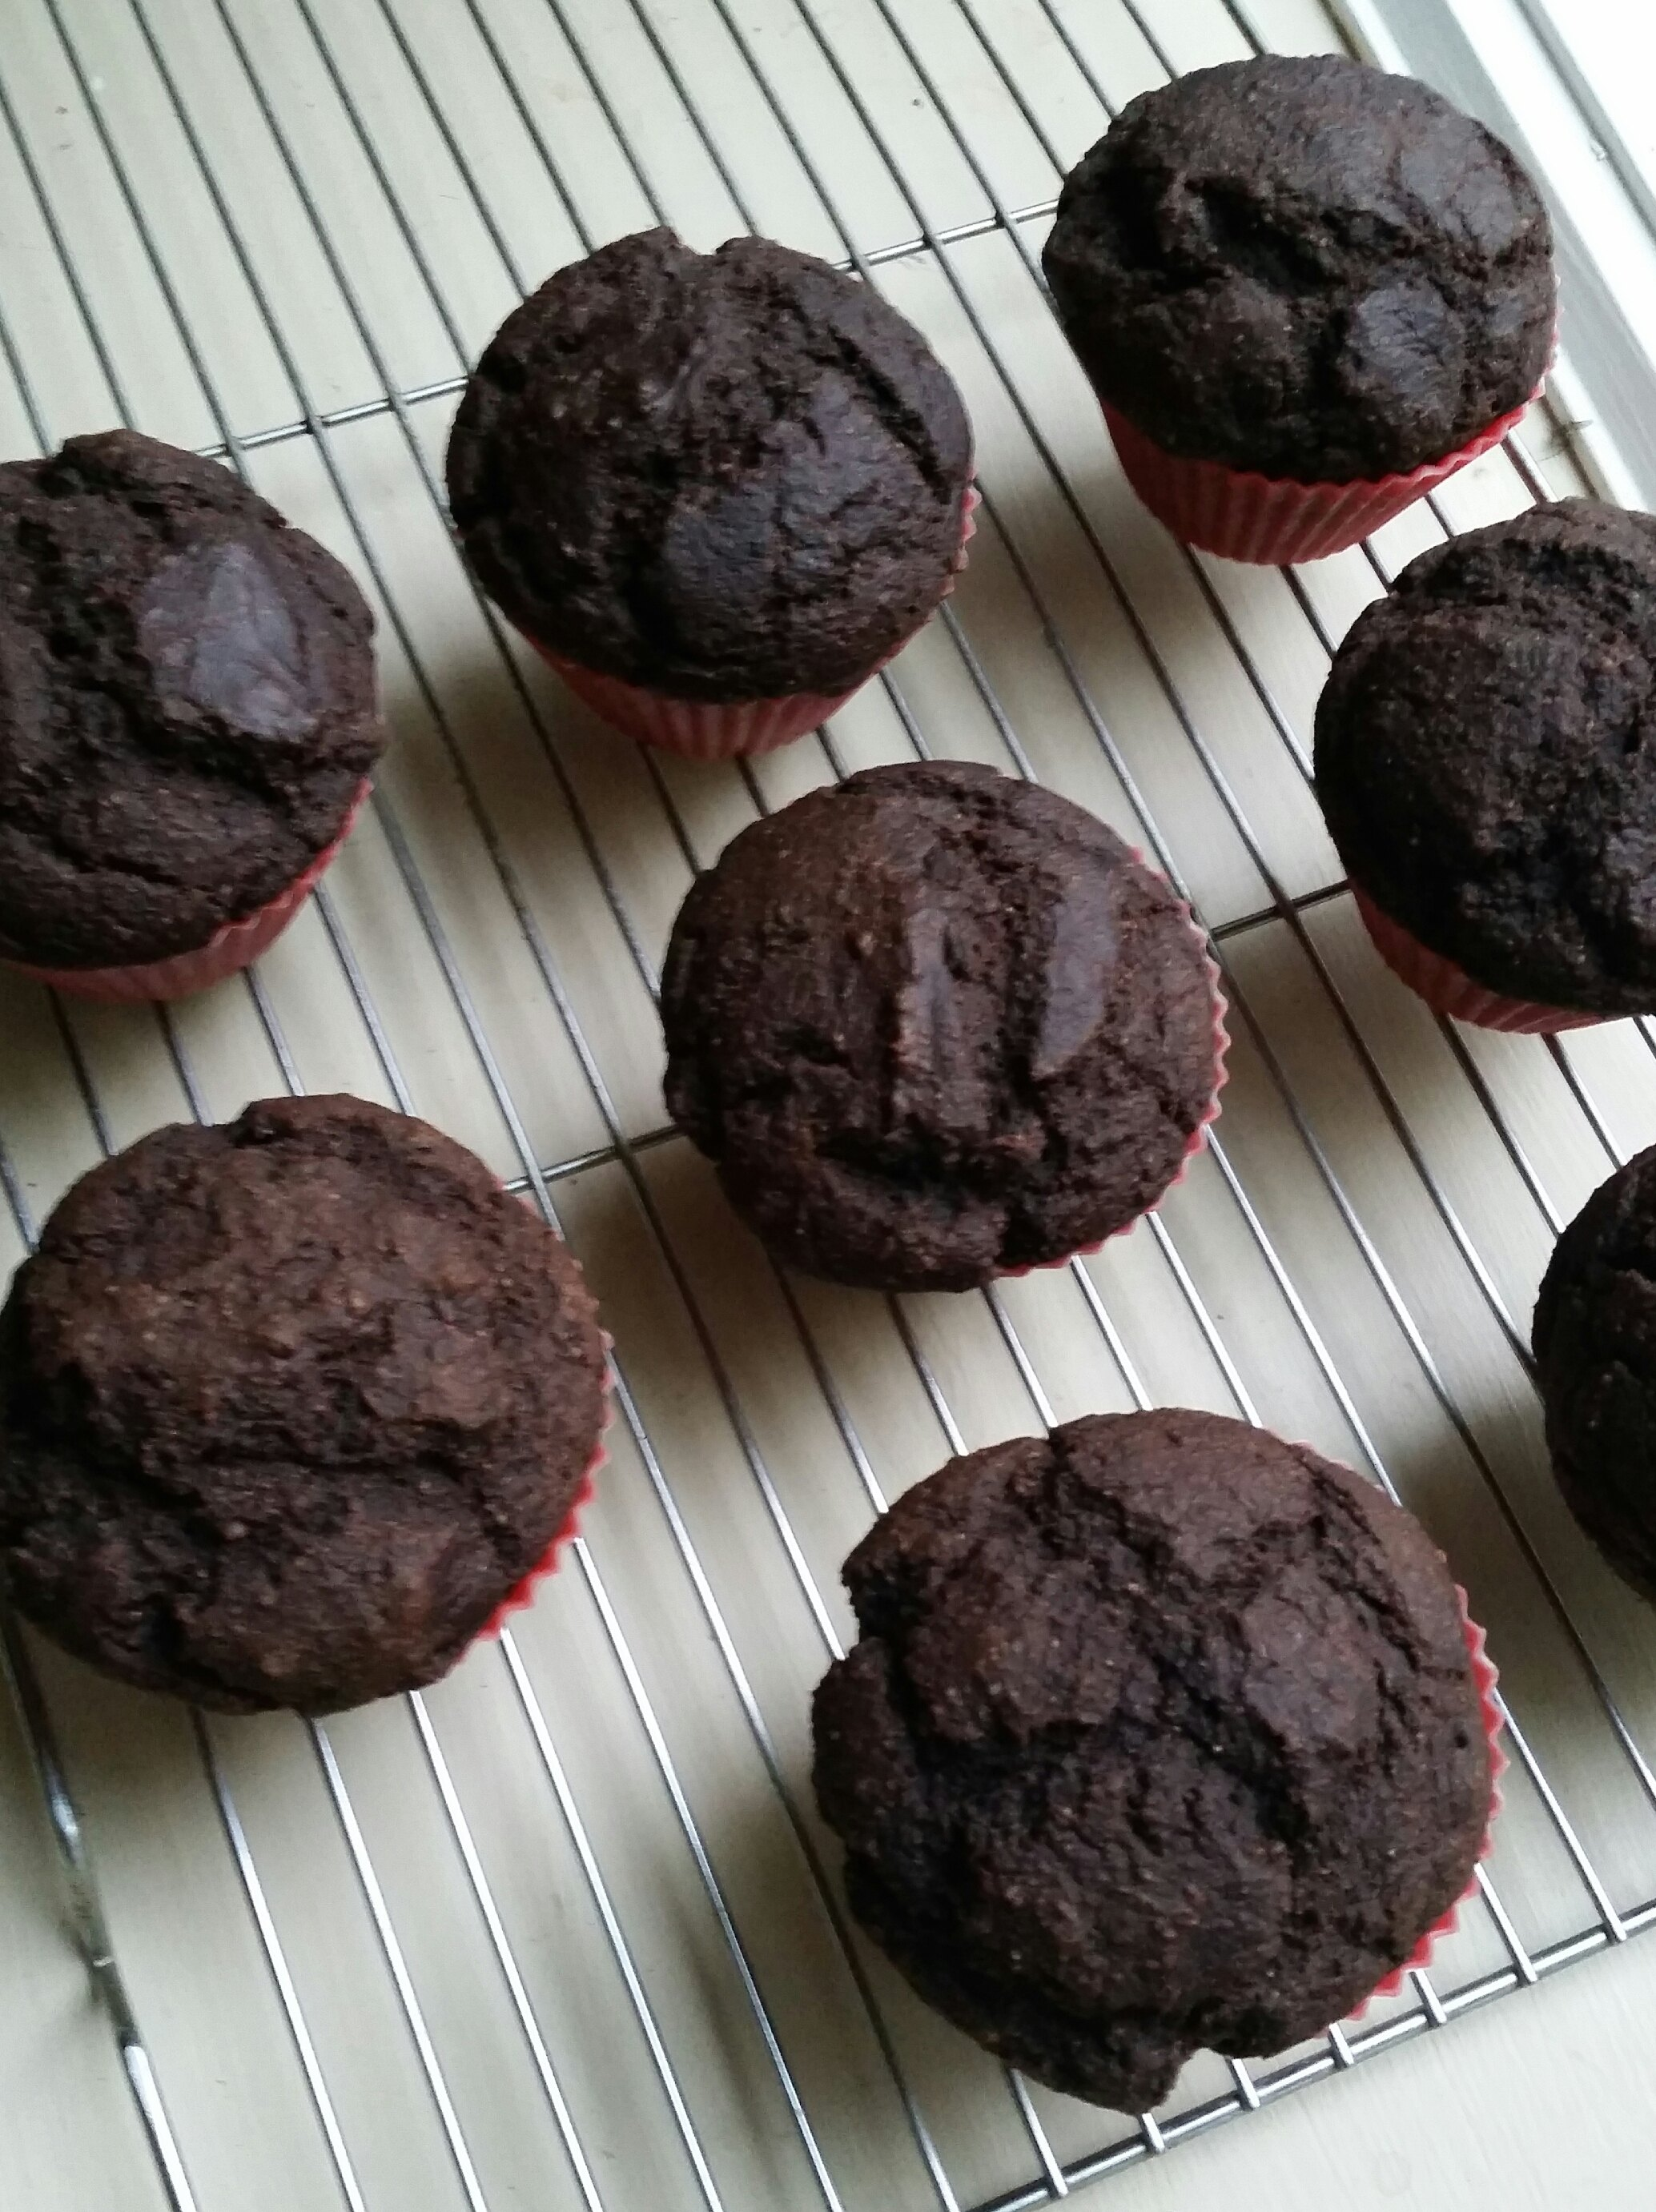 Dark Chocolate Apple Cider Muffins (Vegan, One-Bowl Recipe)